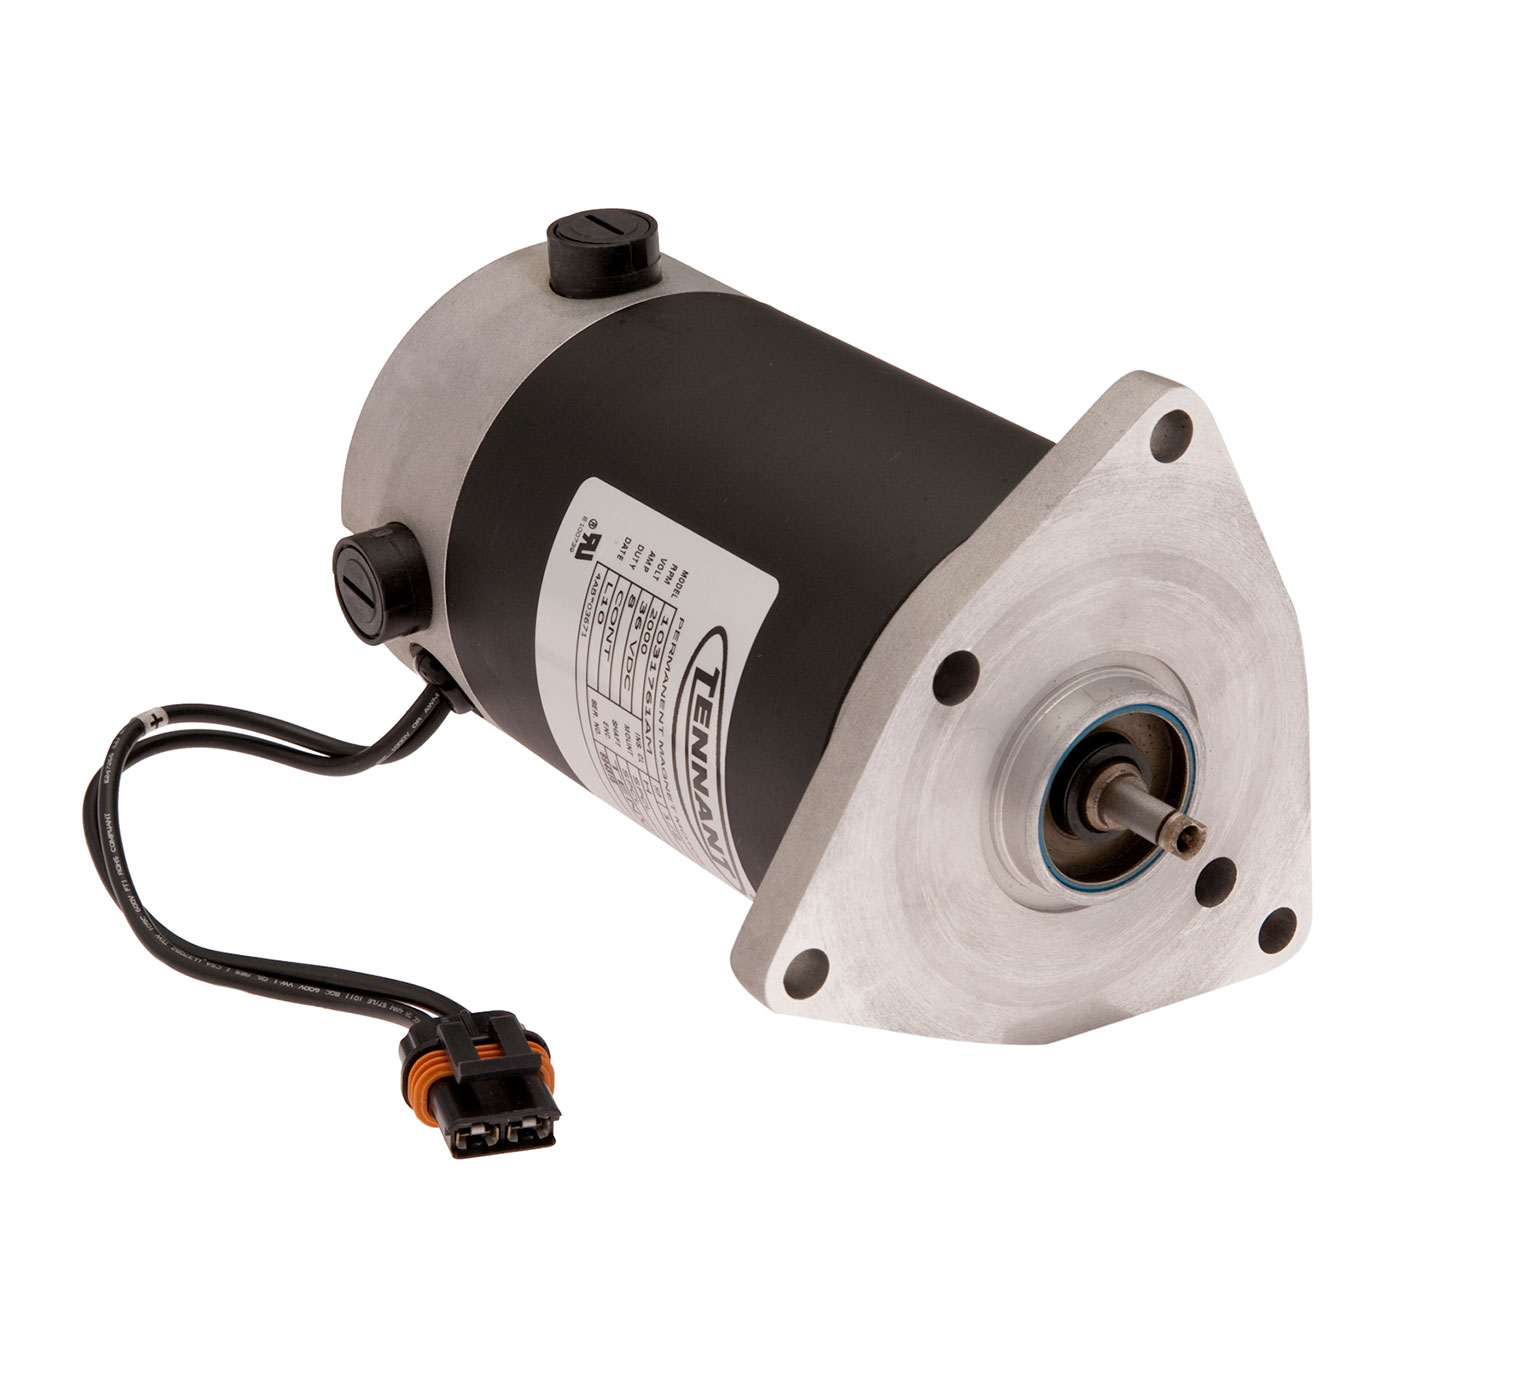 5 Hp Electric Motor >> Electric Motor 5 Hp 36 Volt 1031761am